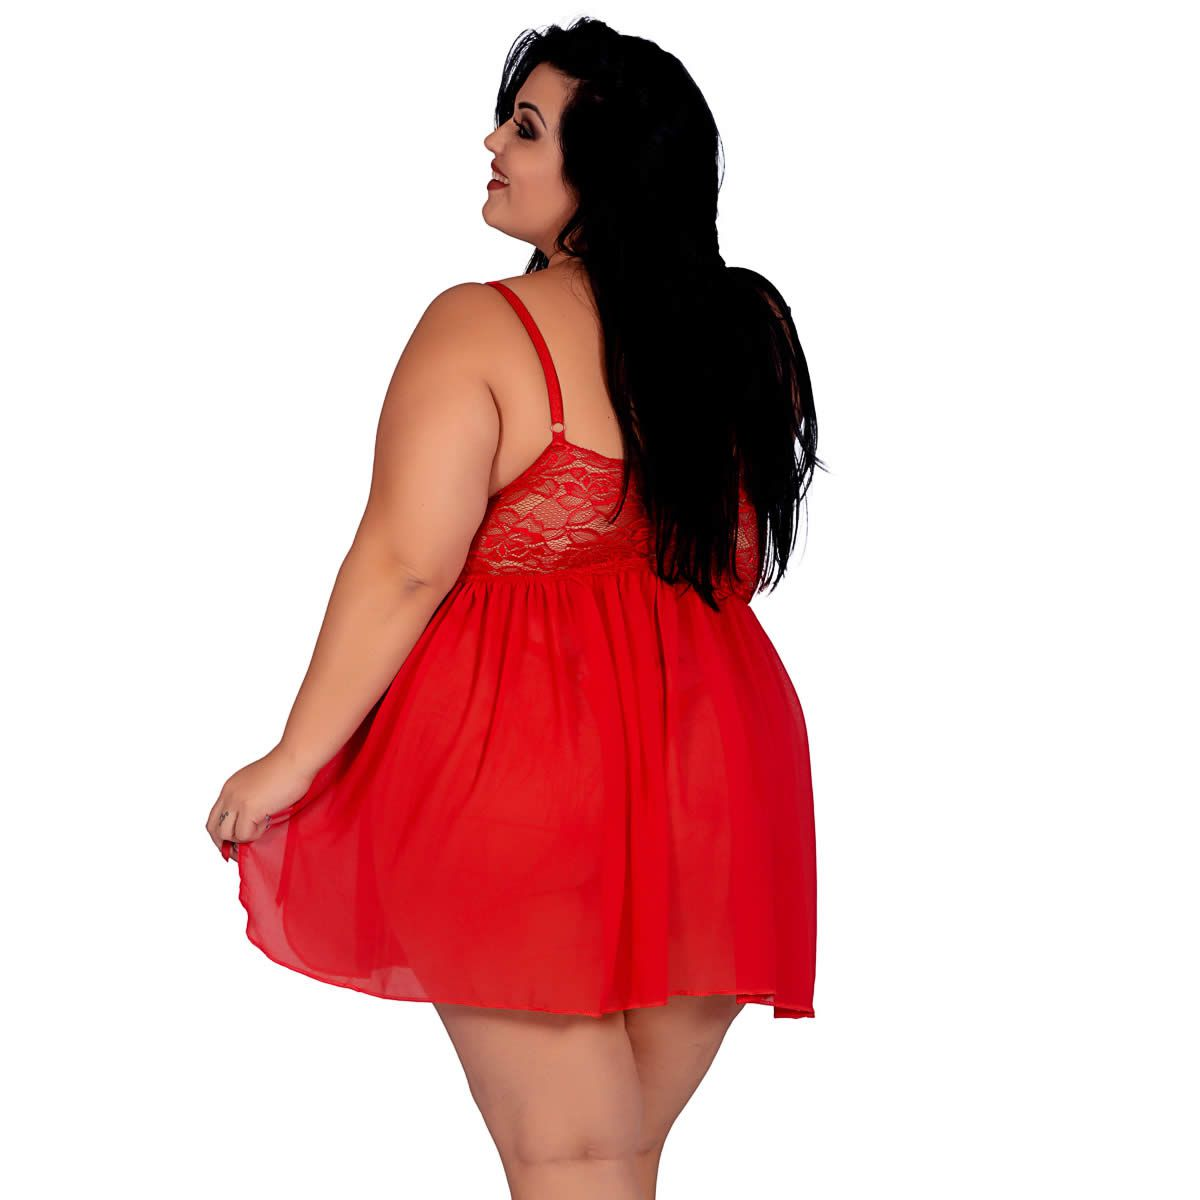 Camisola Vermelha Plus Size em Chiffon e Renda Fany - EK5027